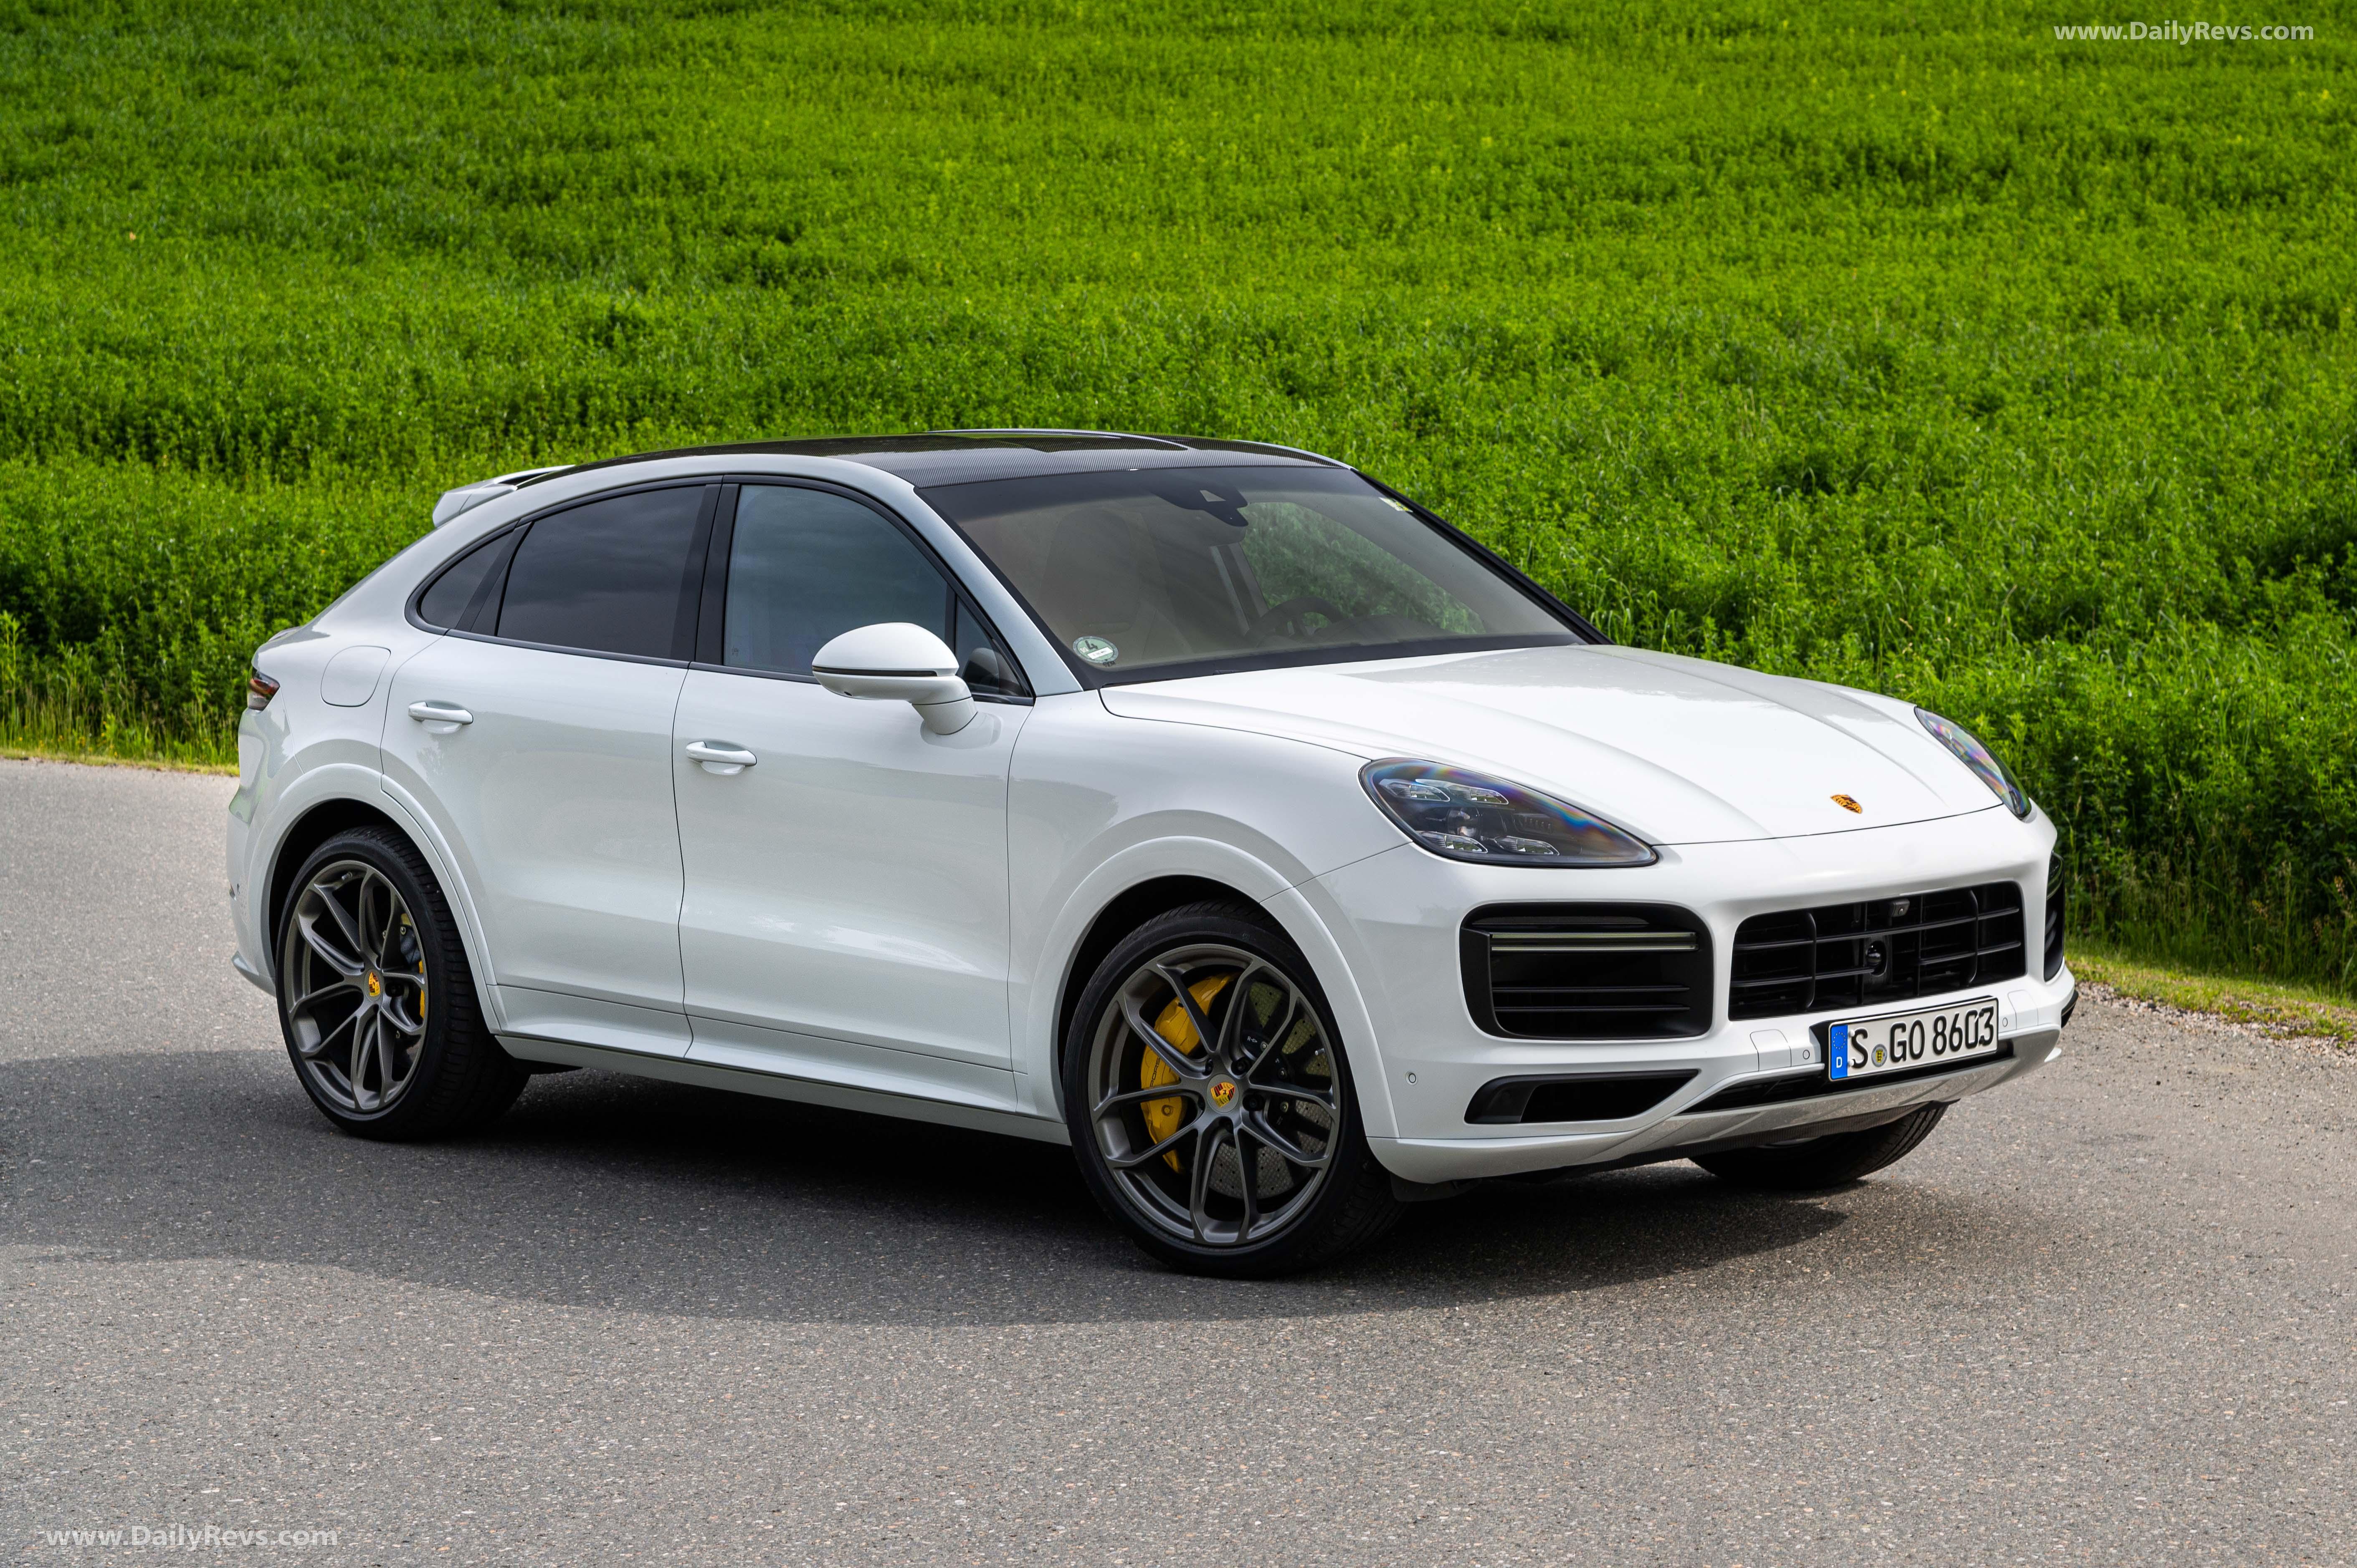 2020 Porsche Cayenne Turbo Coupe - HQ Pictures, Specs ...